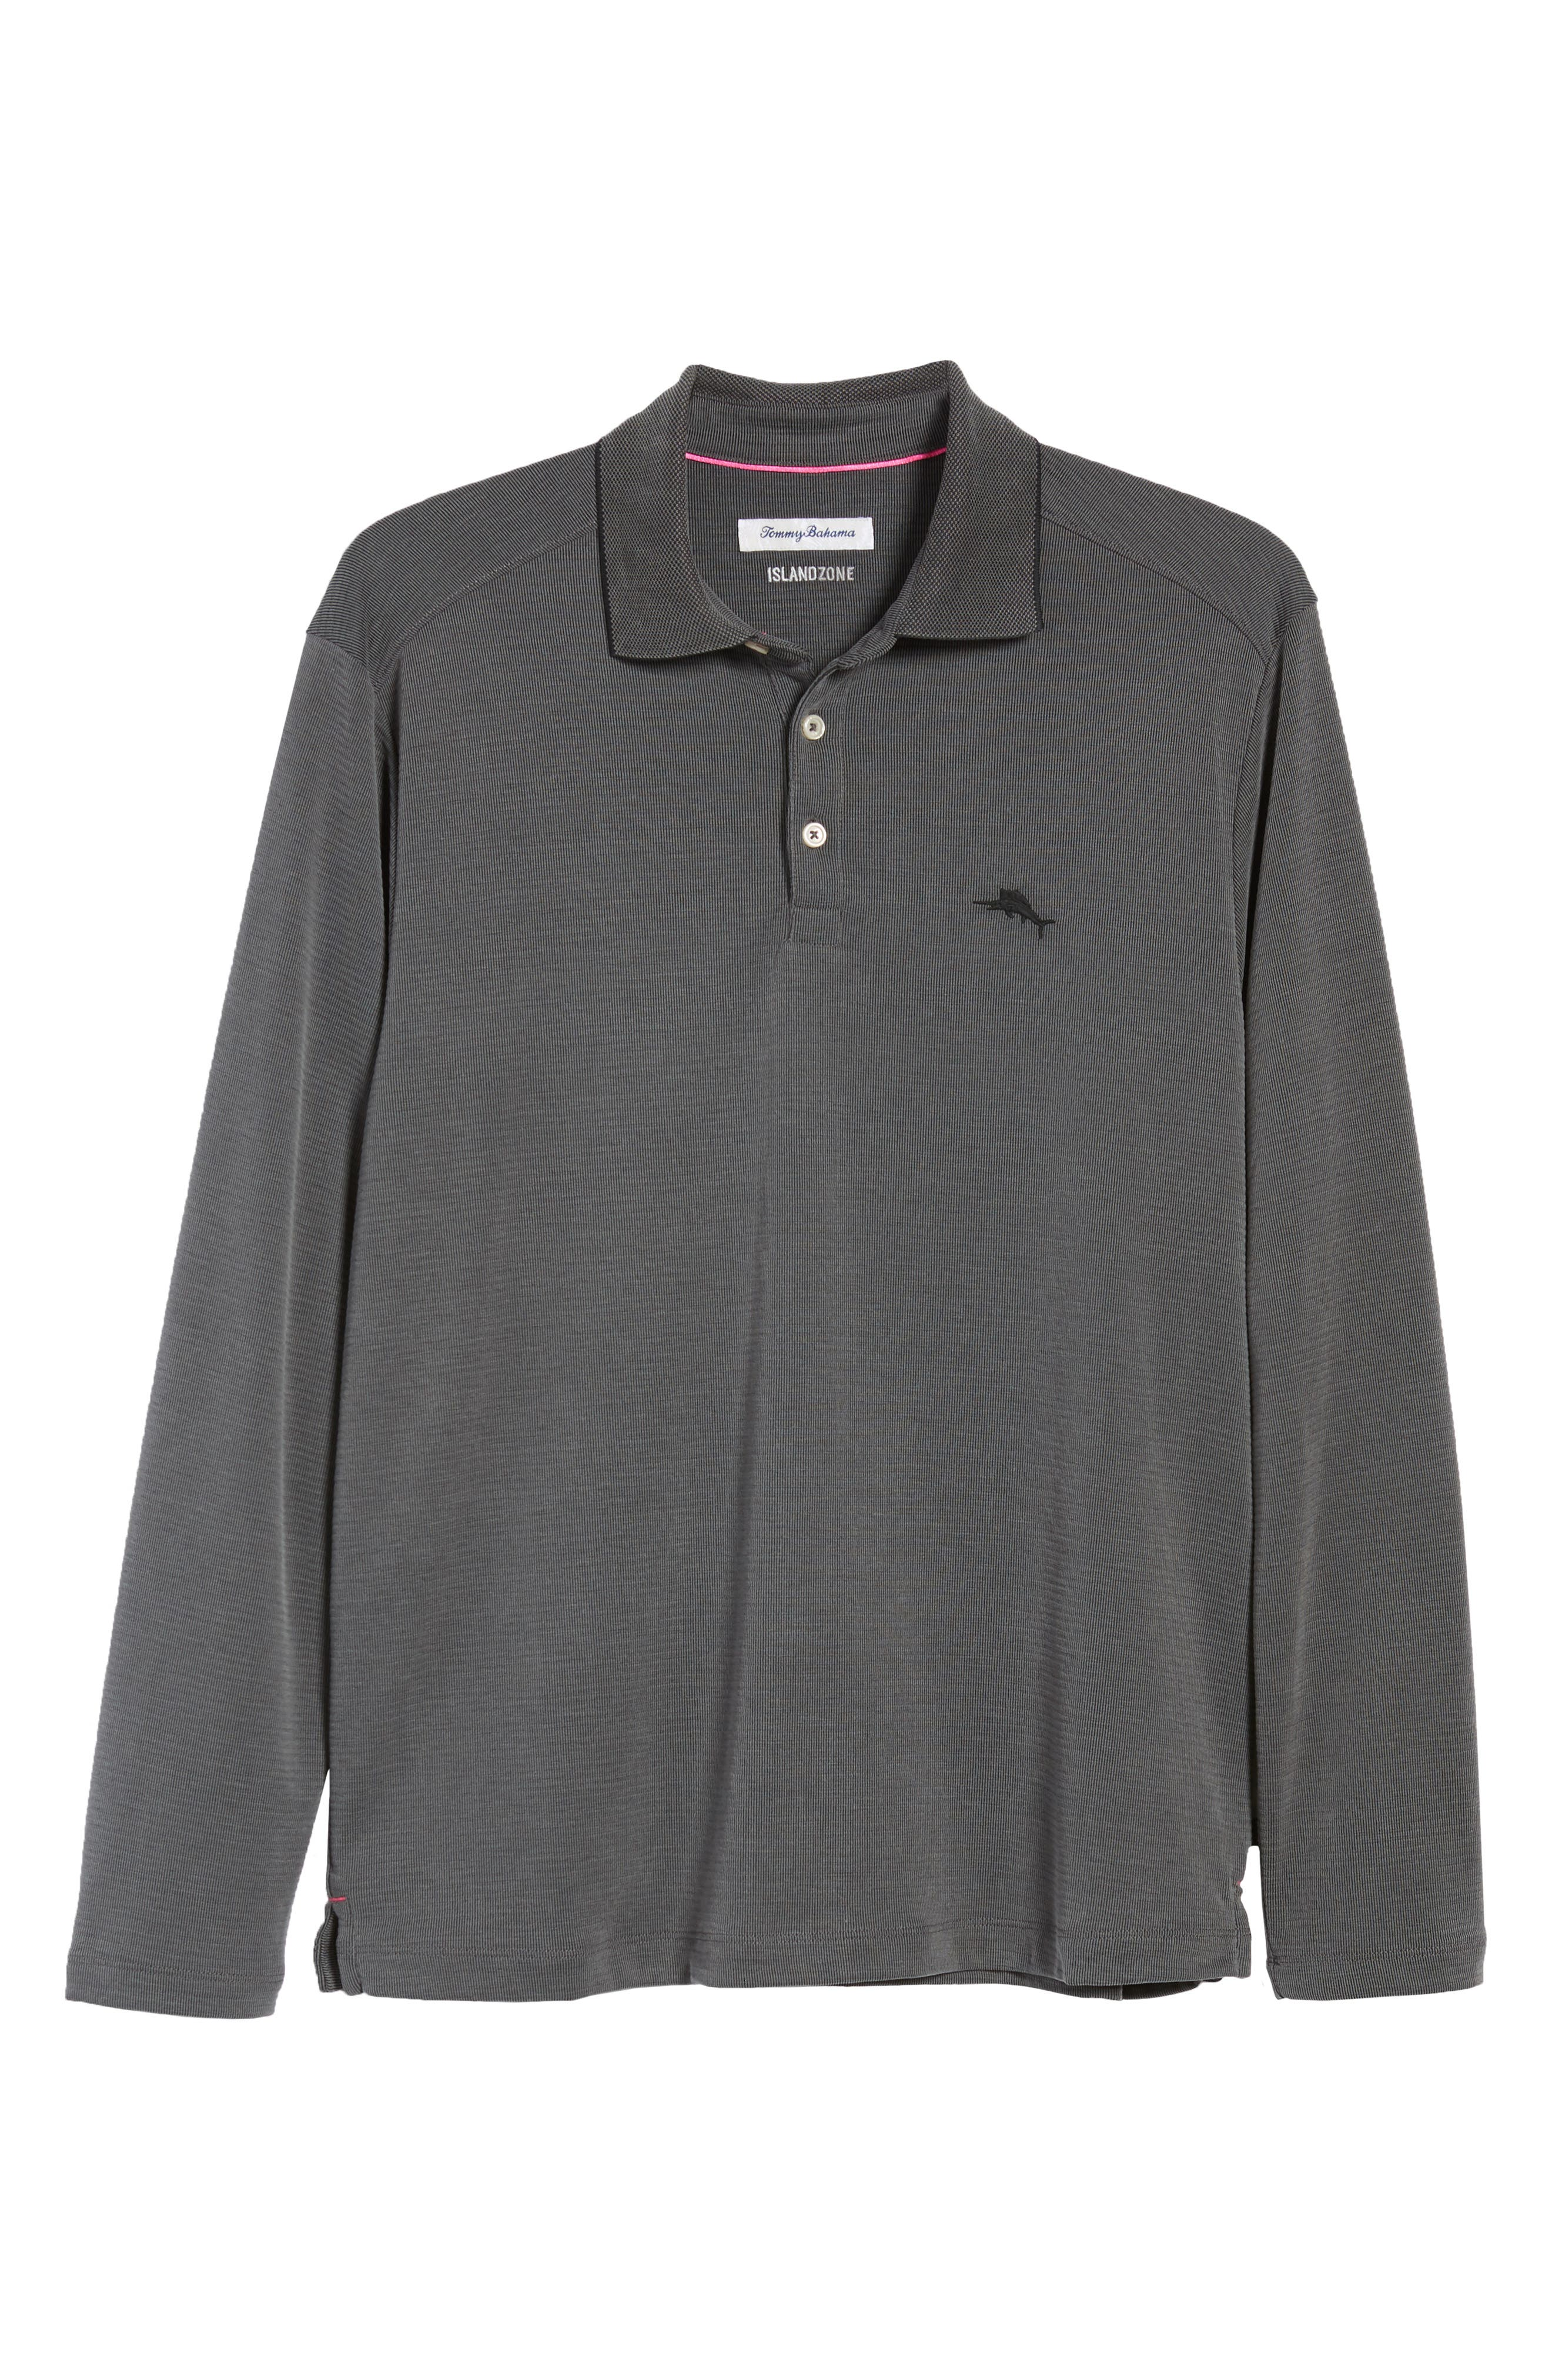 Coastal Crest Regular Fit Polo,                             Alternate thumbnail 6, color,                             BLACK